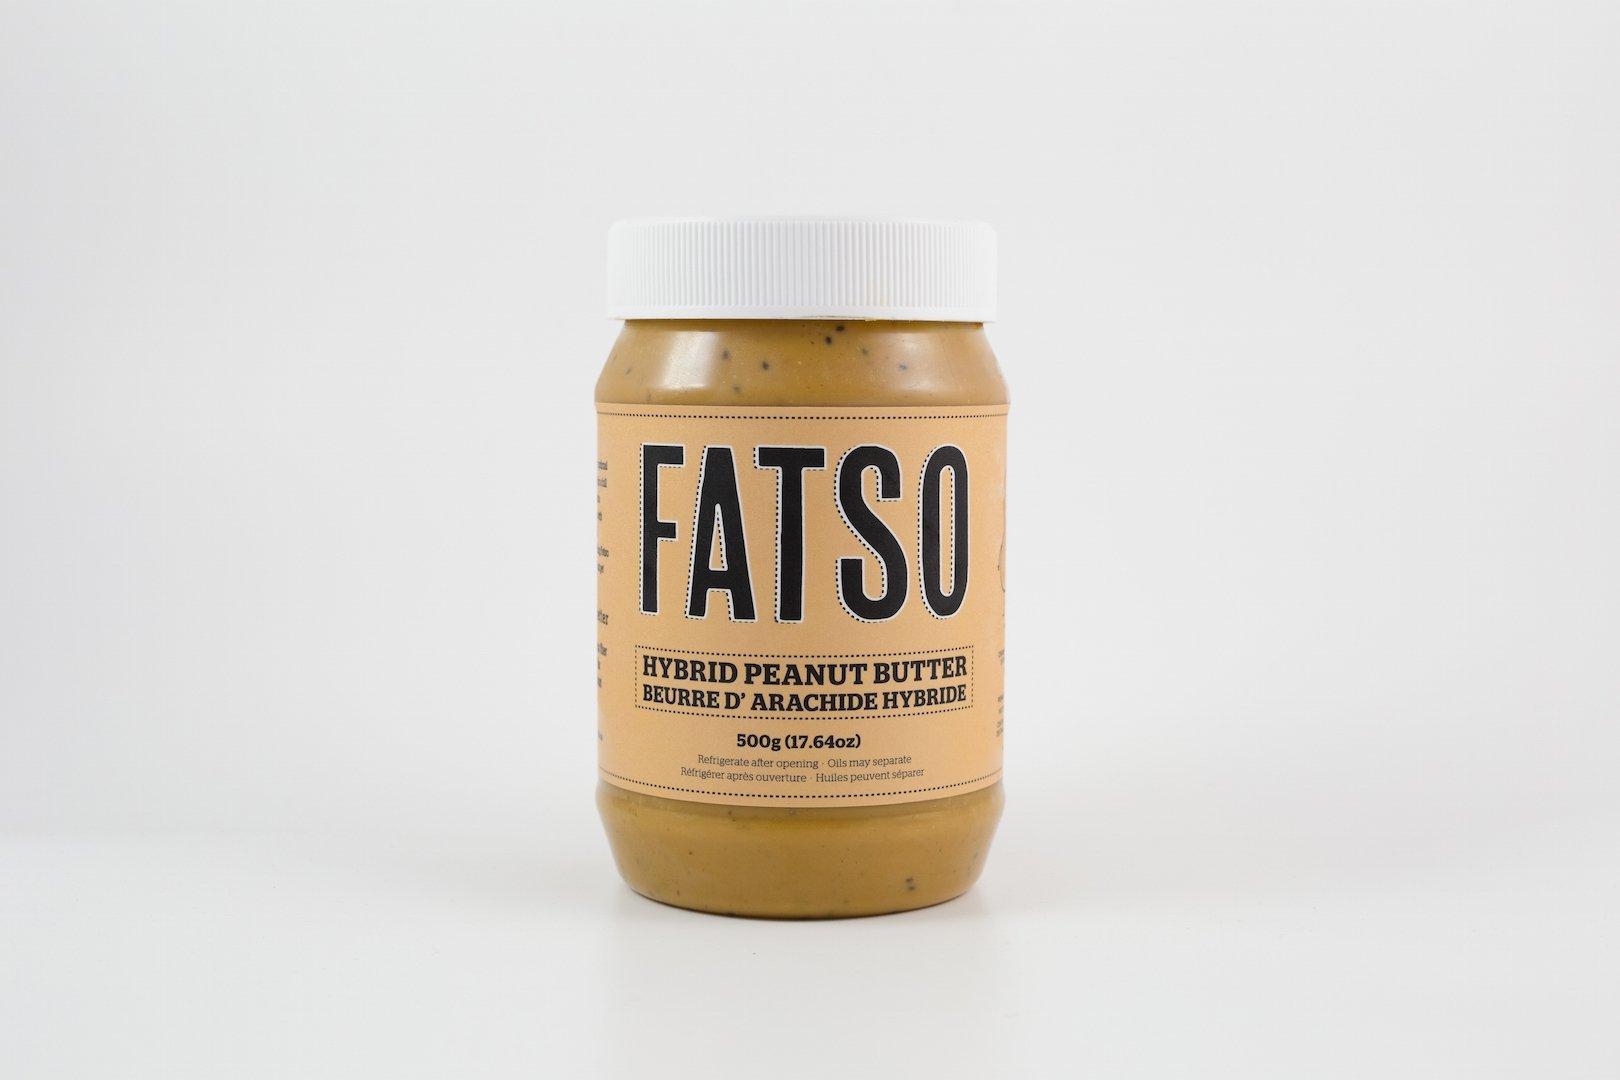 Fatso Hybrid Peanut Butter, 500 g